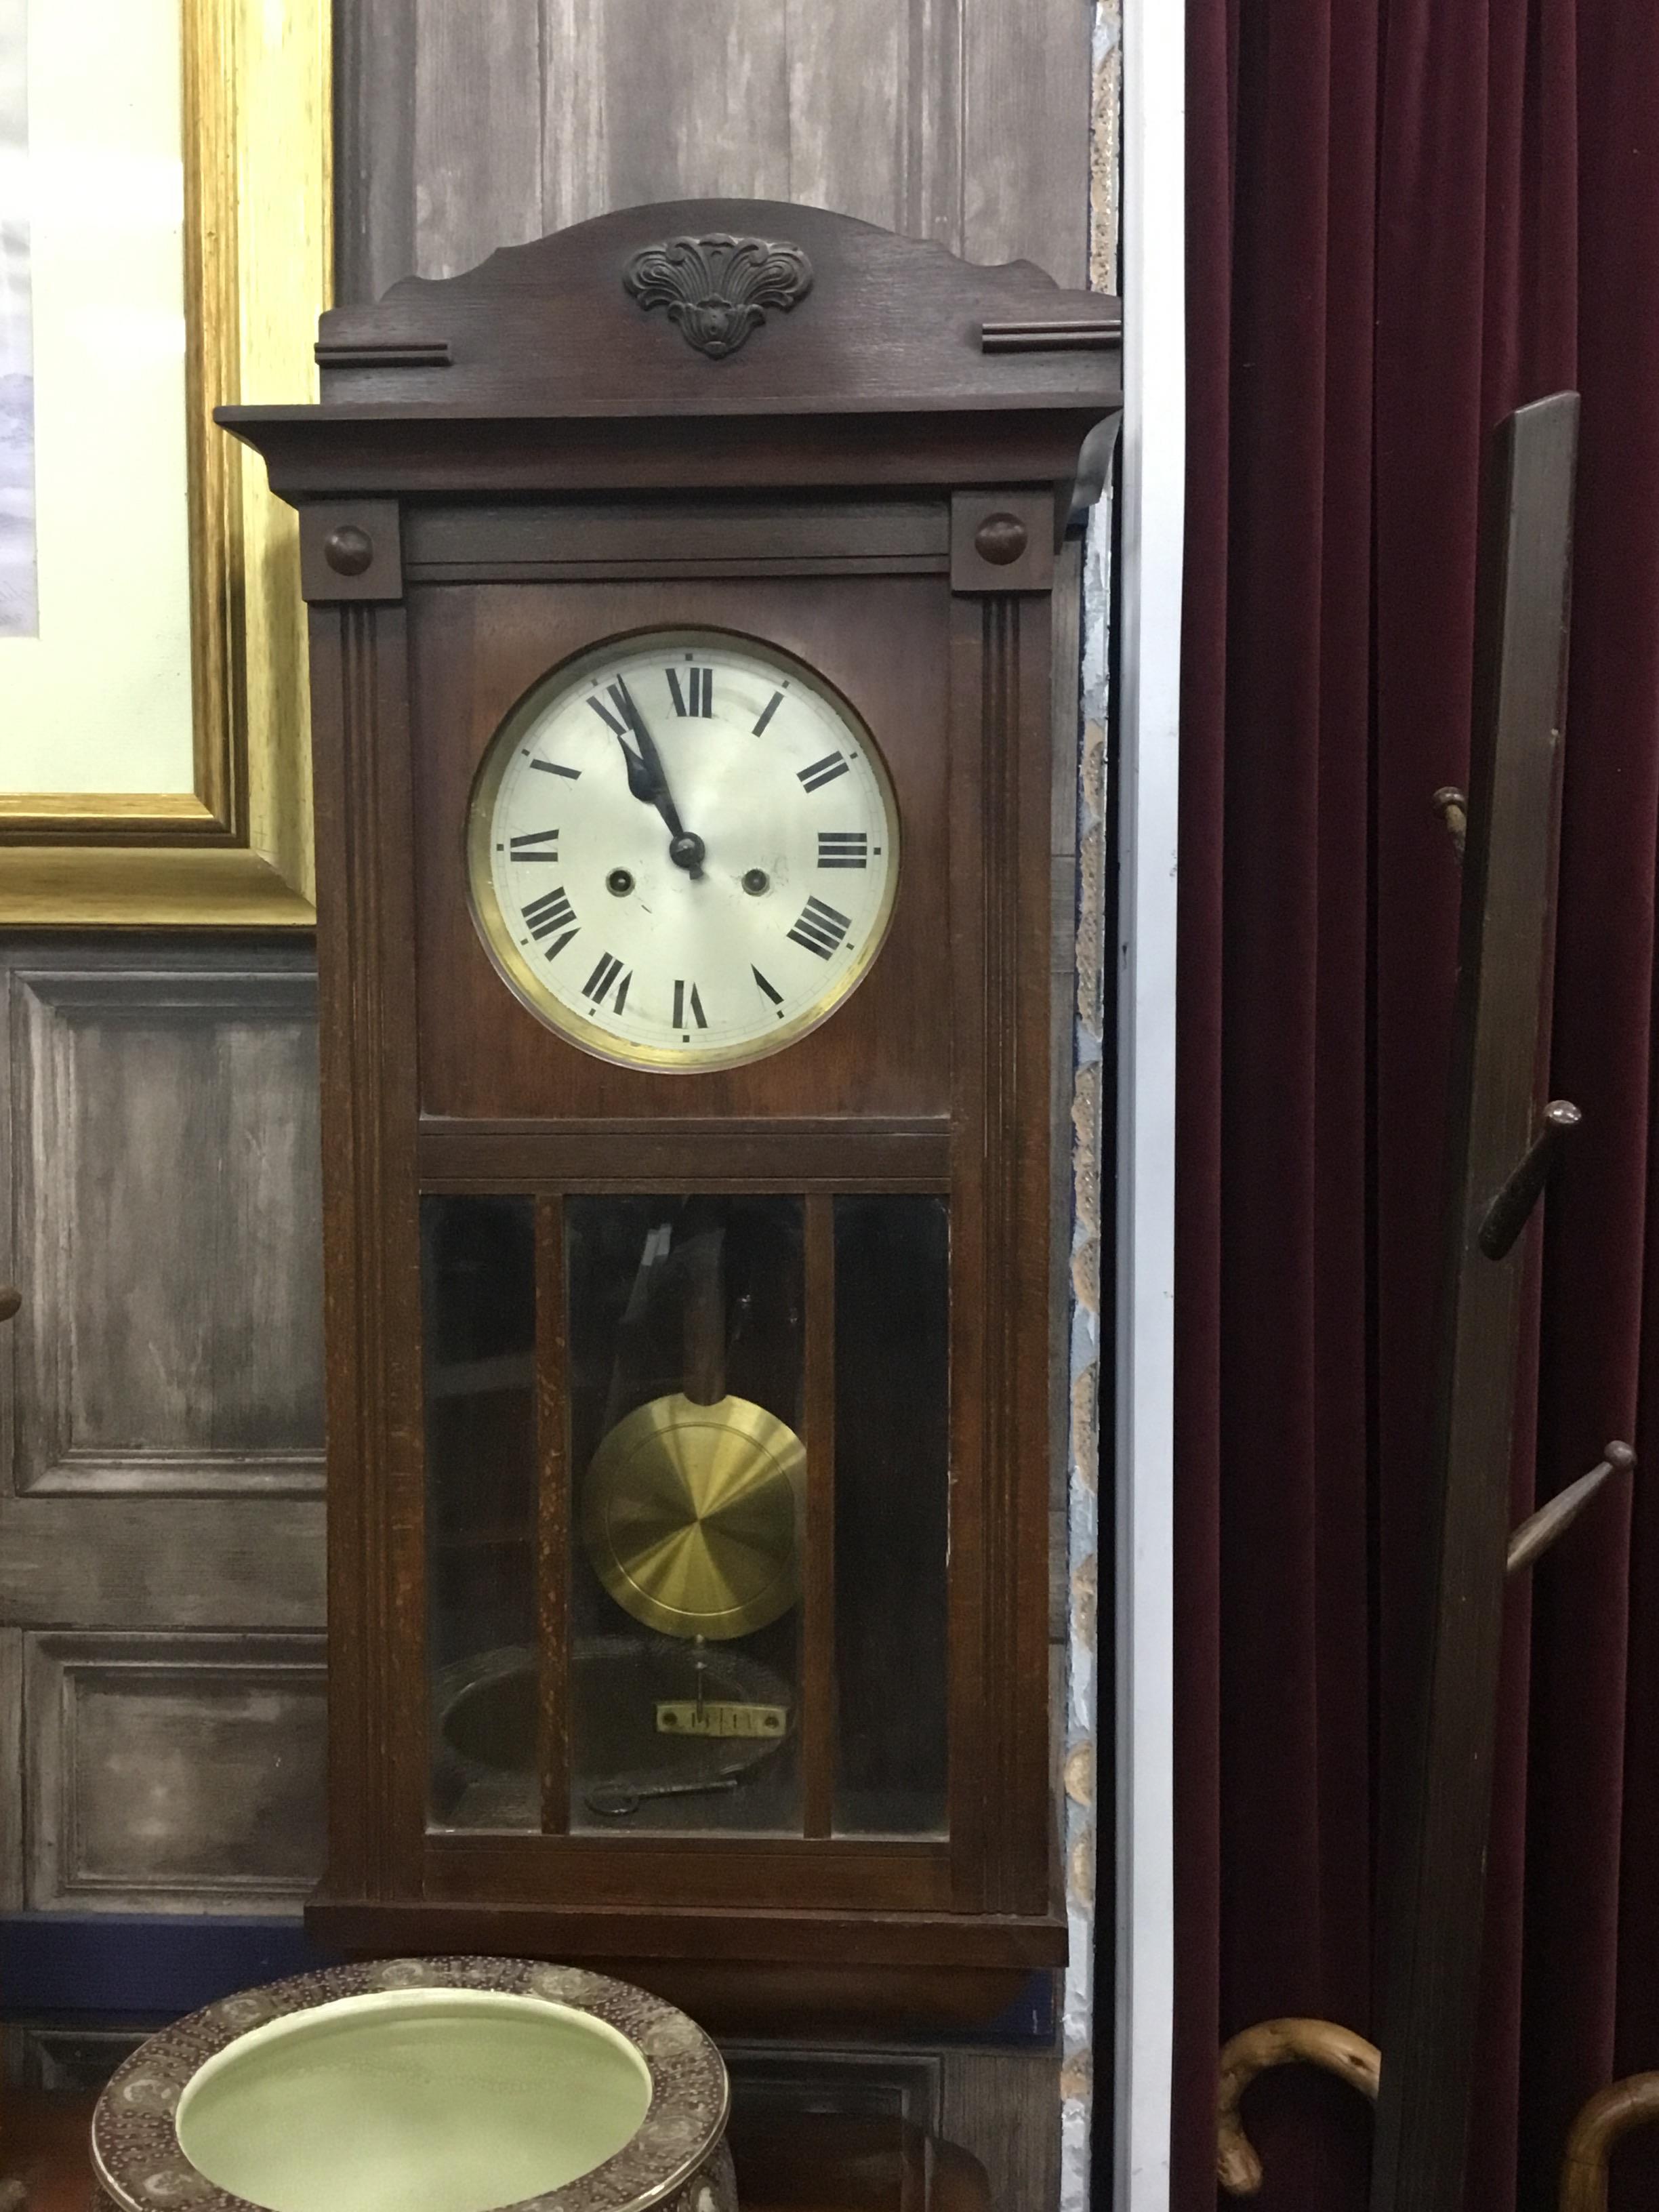 AN EDWARDIAN KITCHEN WALL CLOCK